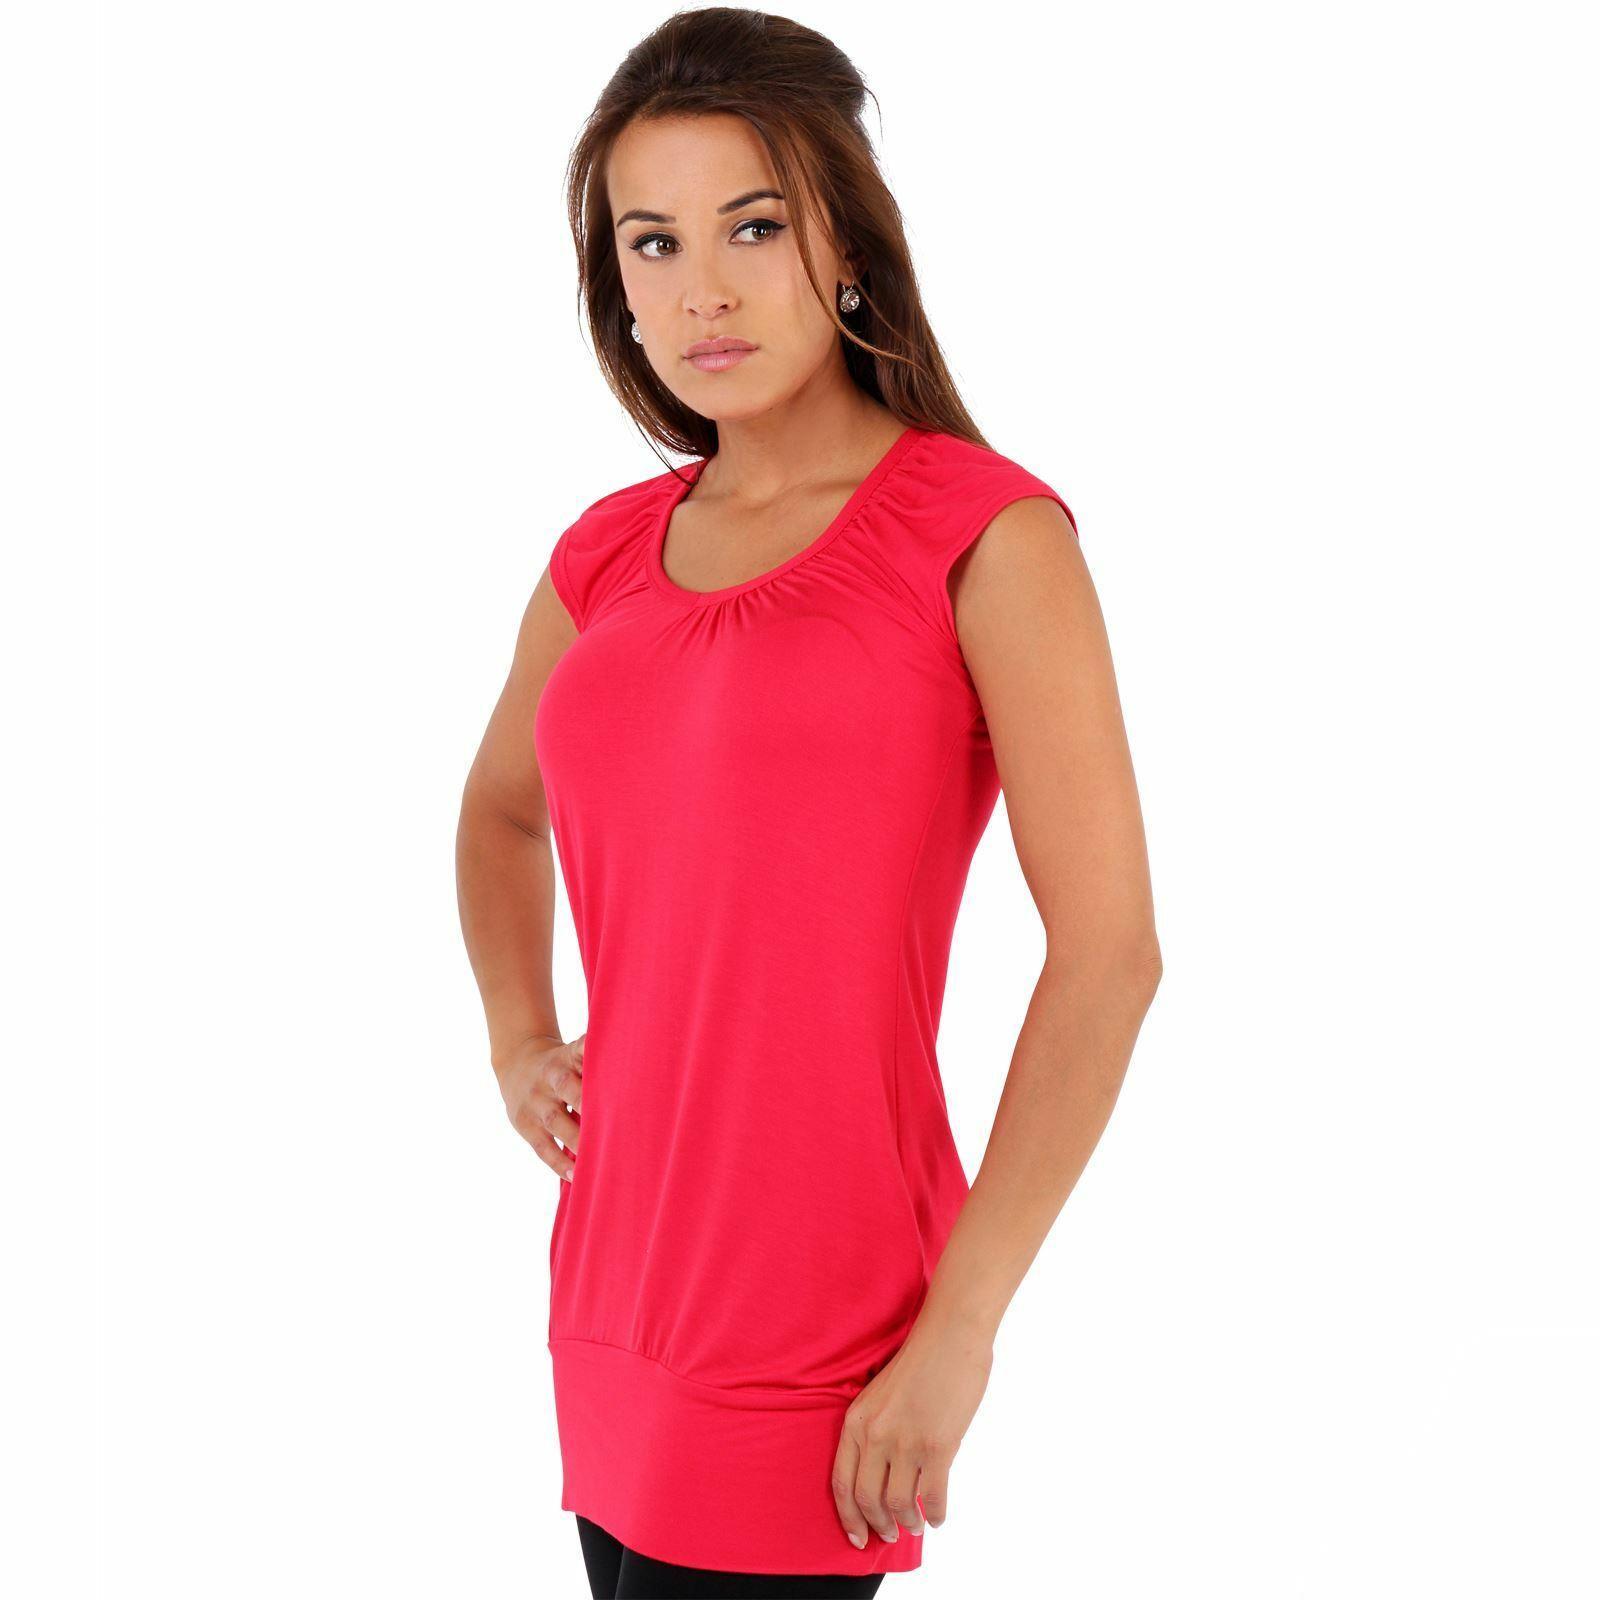 Womens-Ladies-Plain-T-Shirt-Short-Sleeve-Long-Loose-V-Neck-Blouse-Tunic-Top thumbnail 48